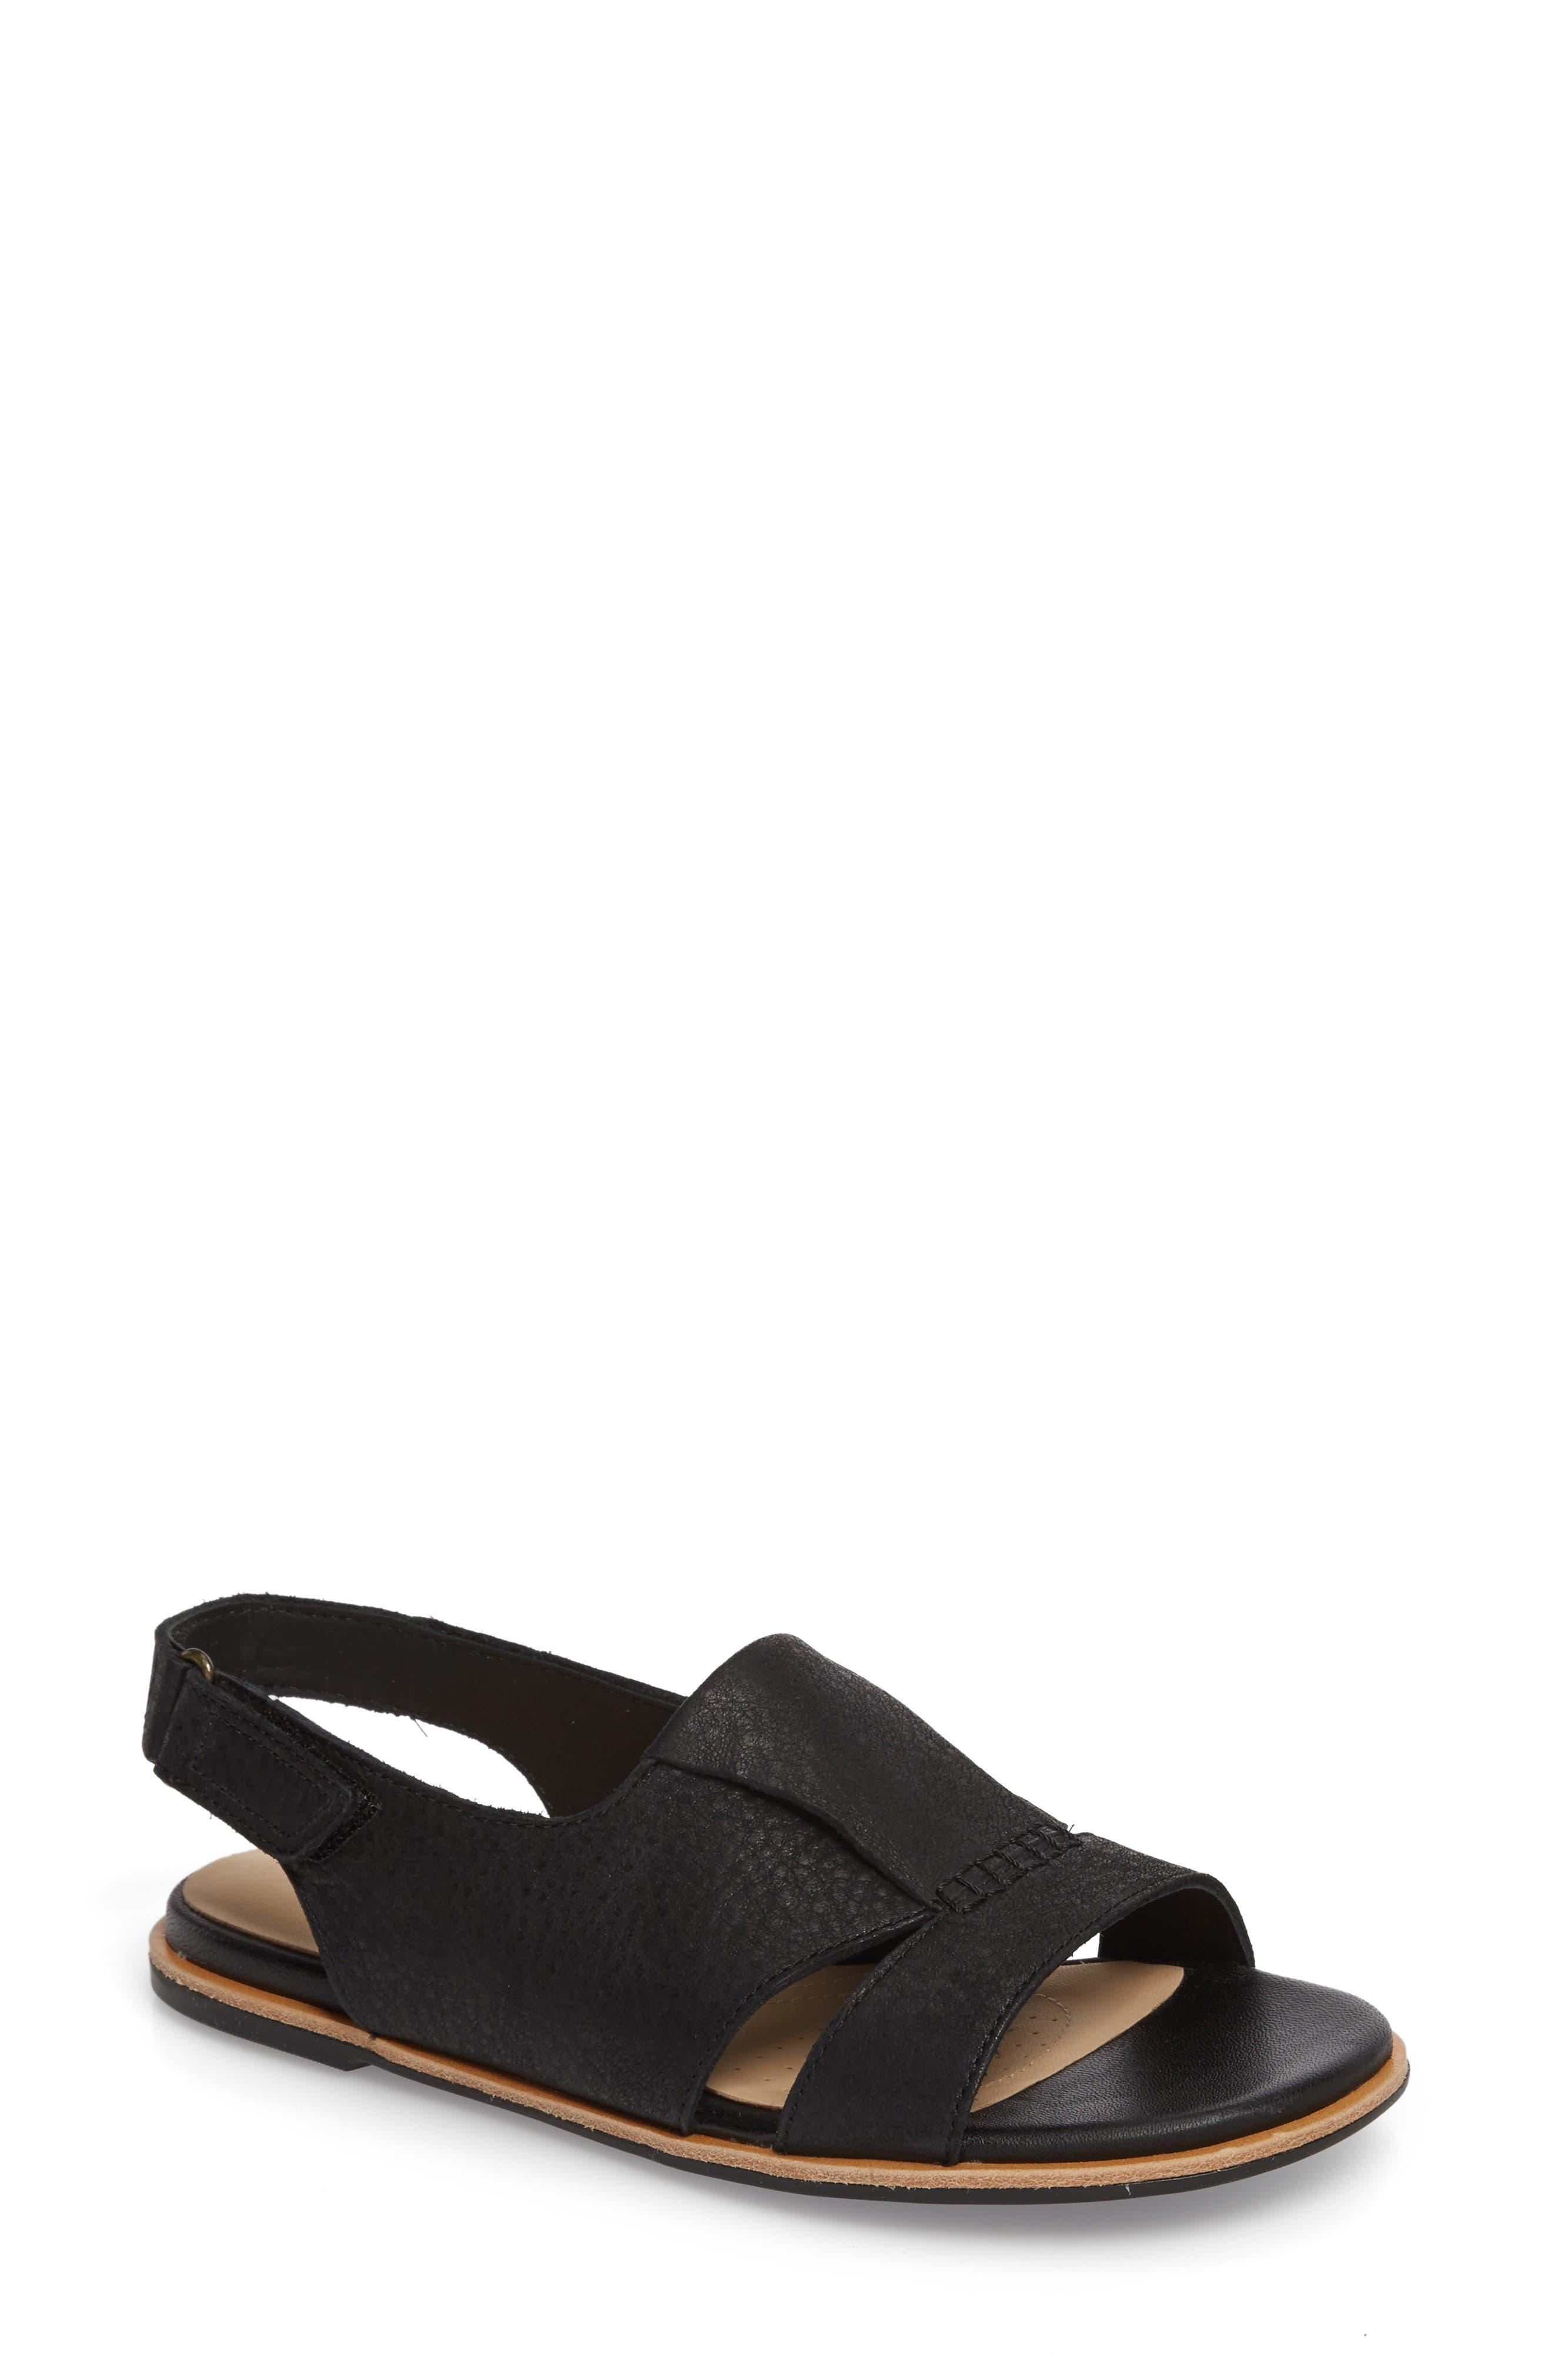 Sultana Rayne Slingback Sandal,                         Main,                         color, 003